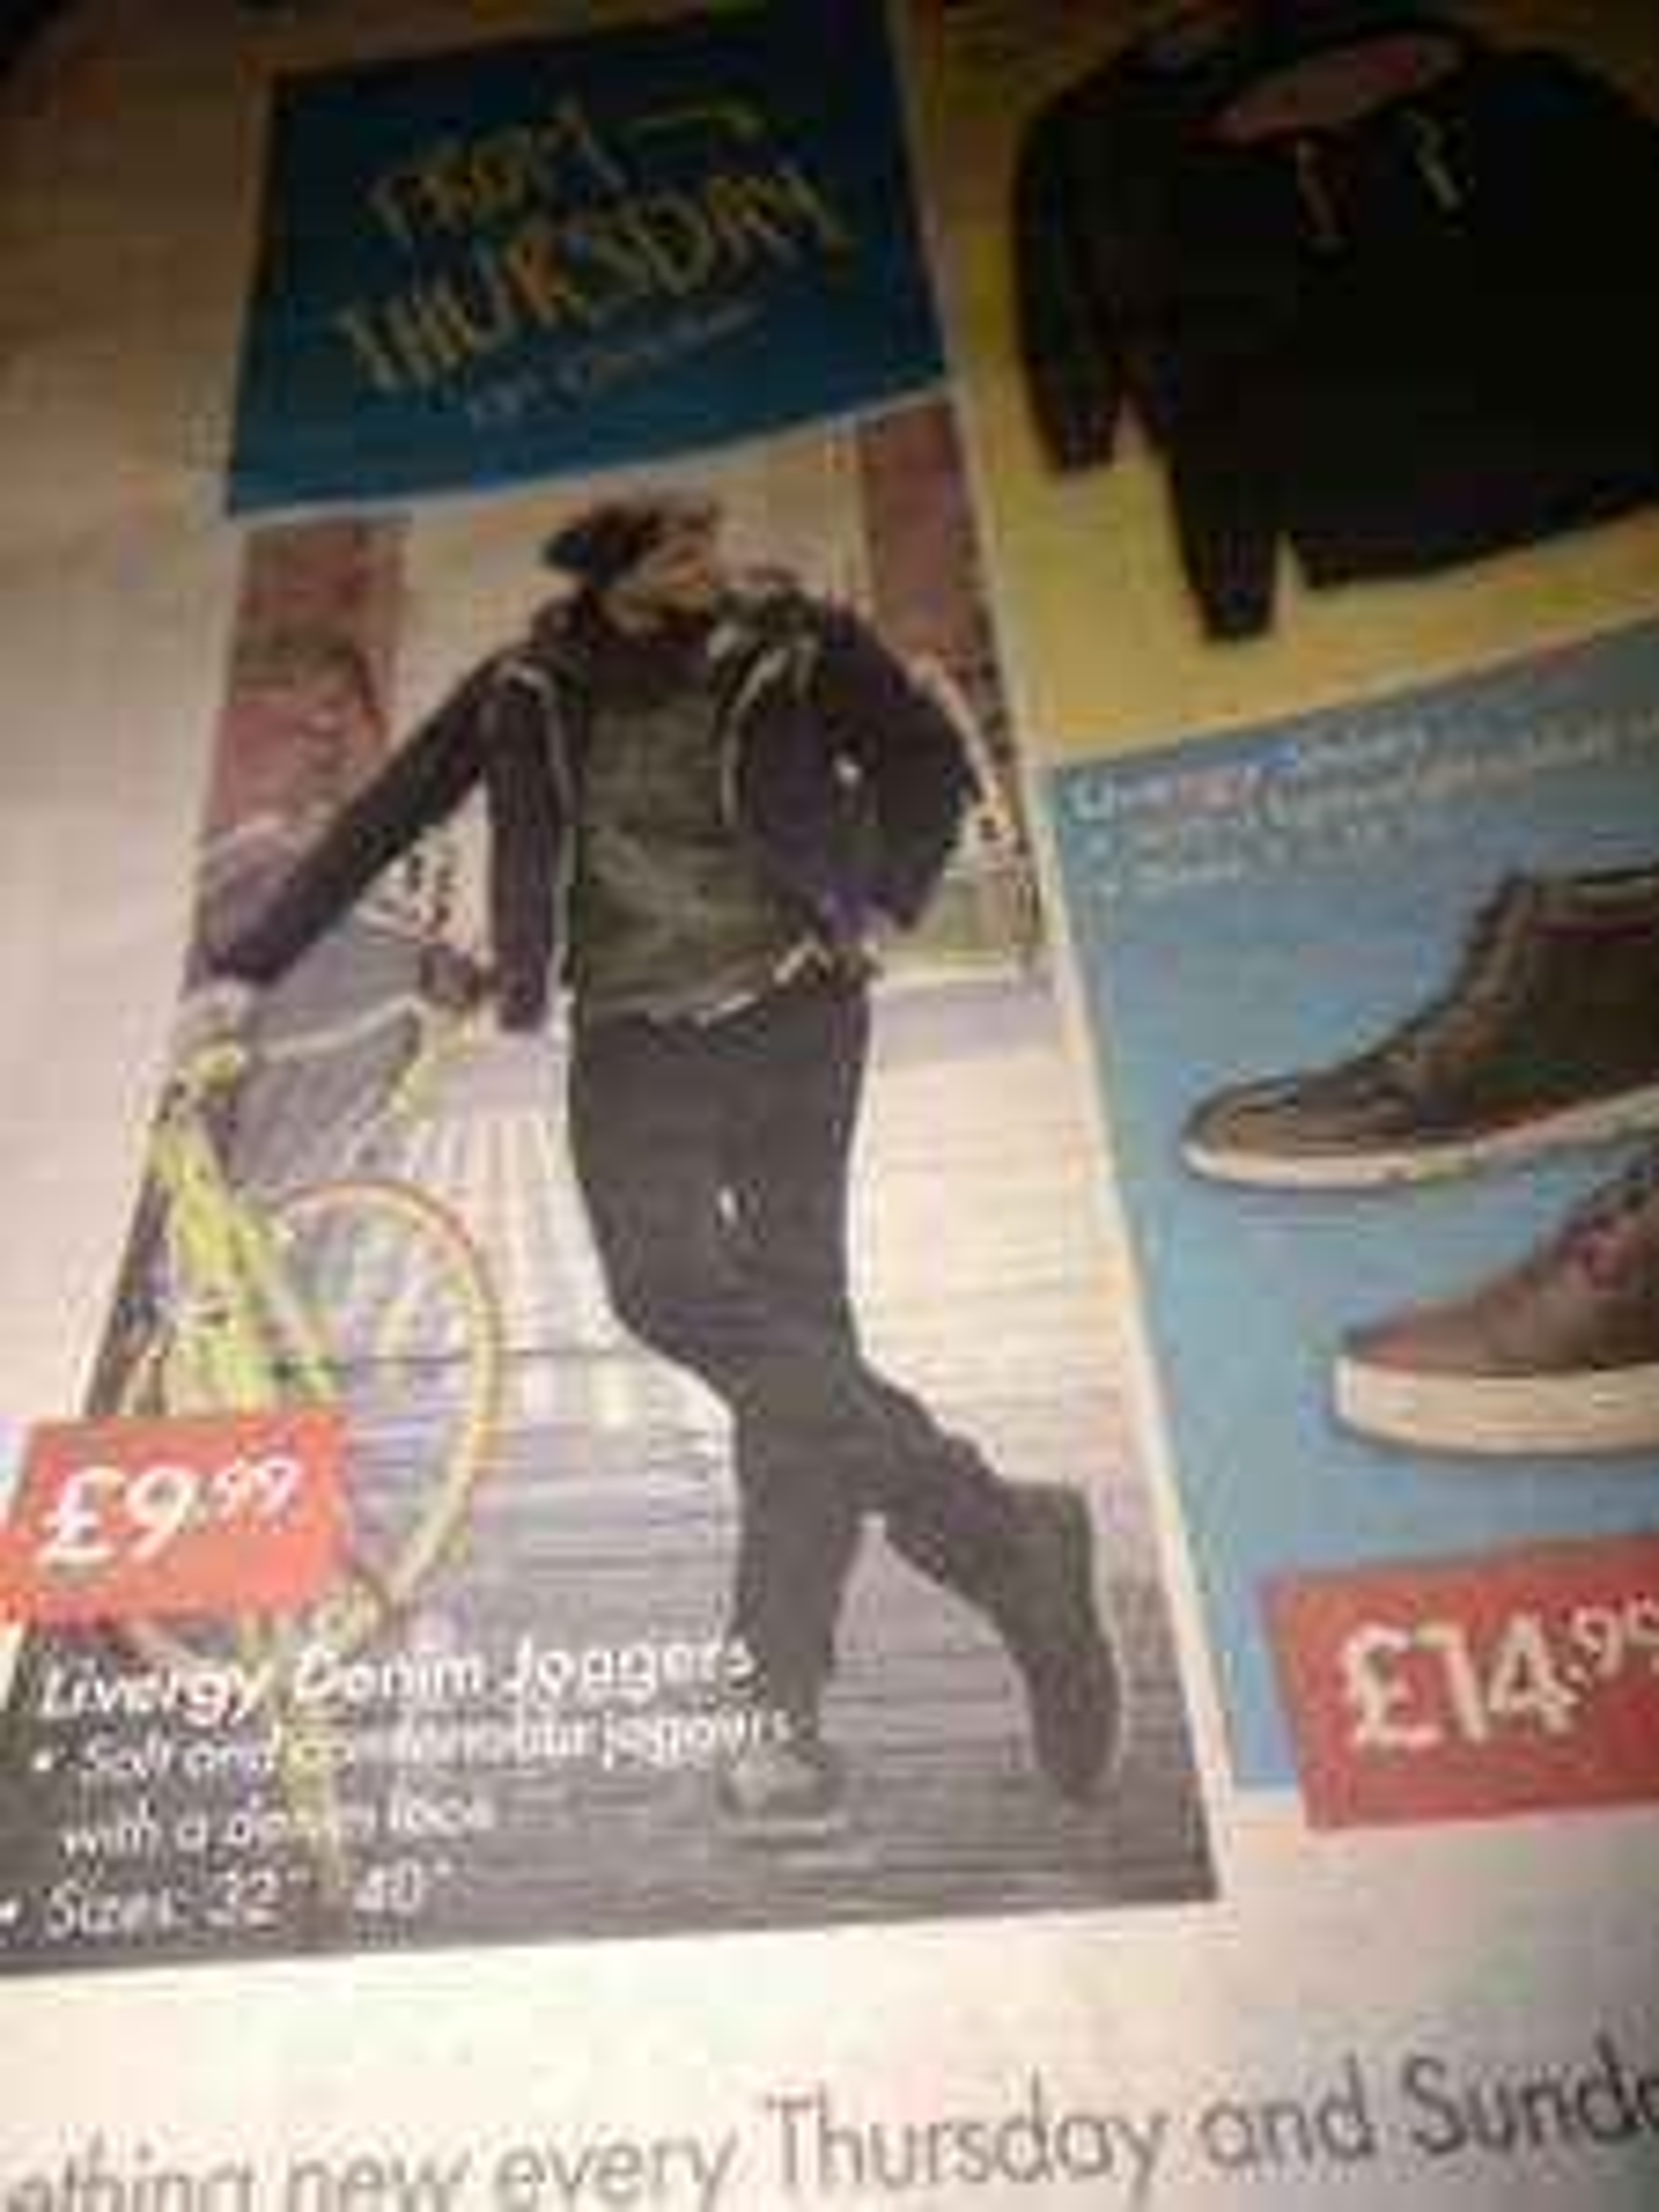 Livegy Denim Joggers Lidl £9.99